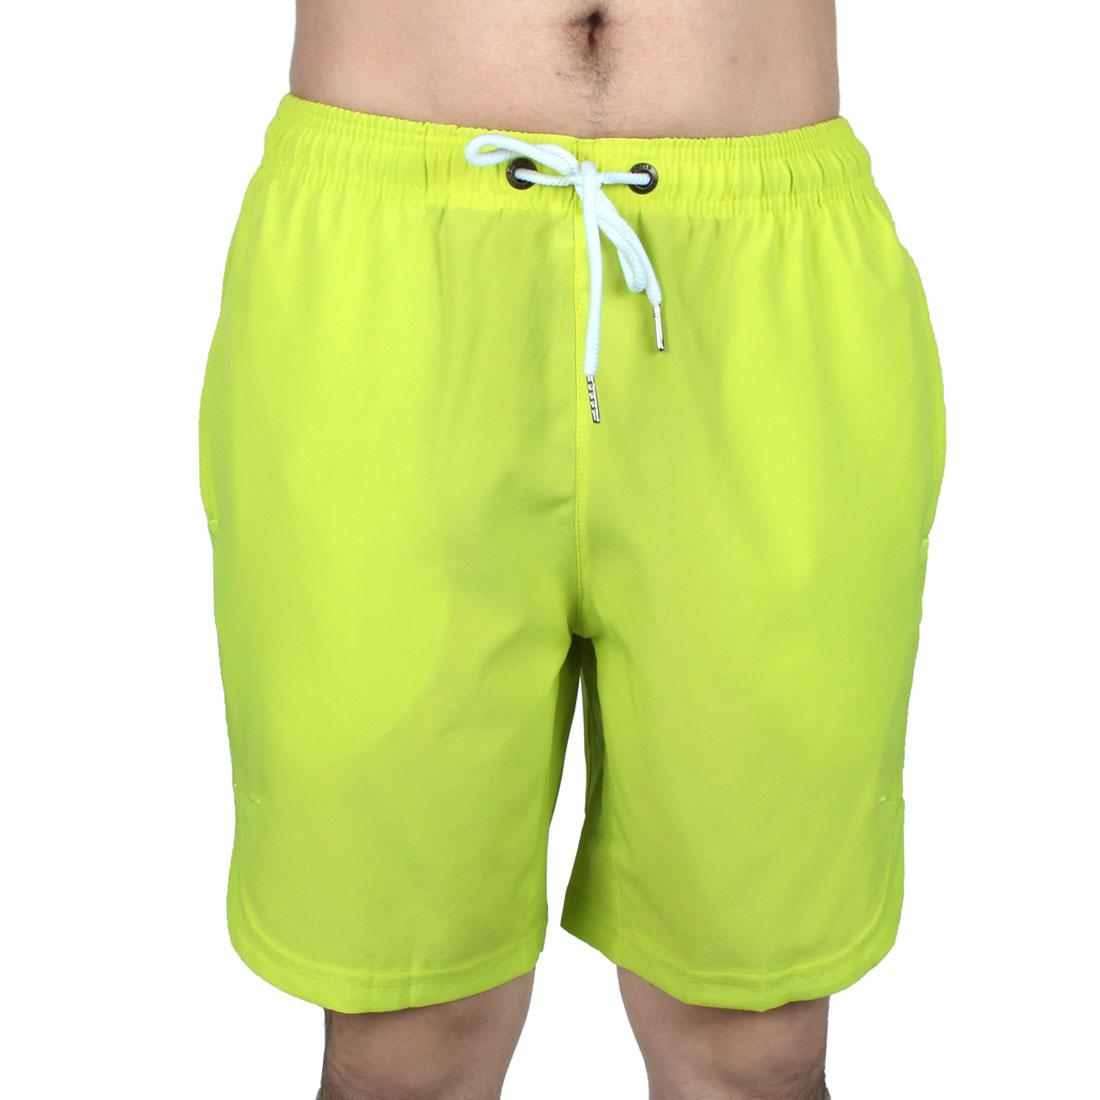 Men Athletics Running Polyester Summer Beach Surf Board Shorts Pants Green W28